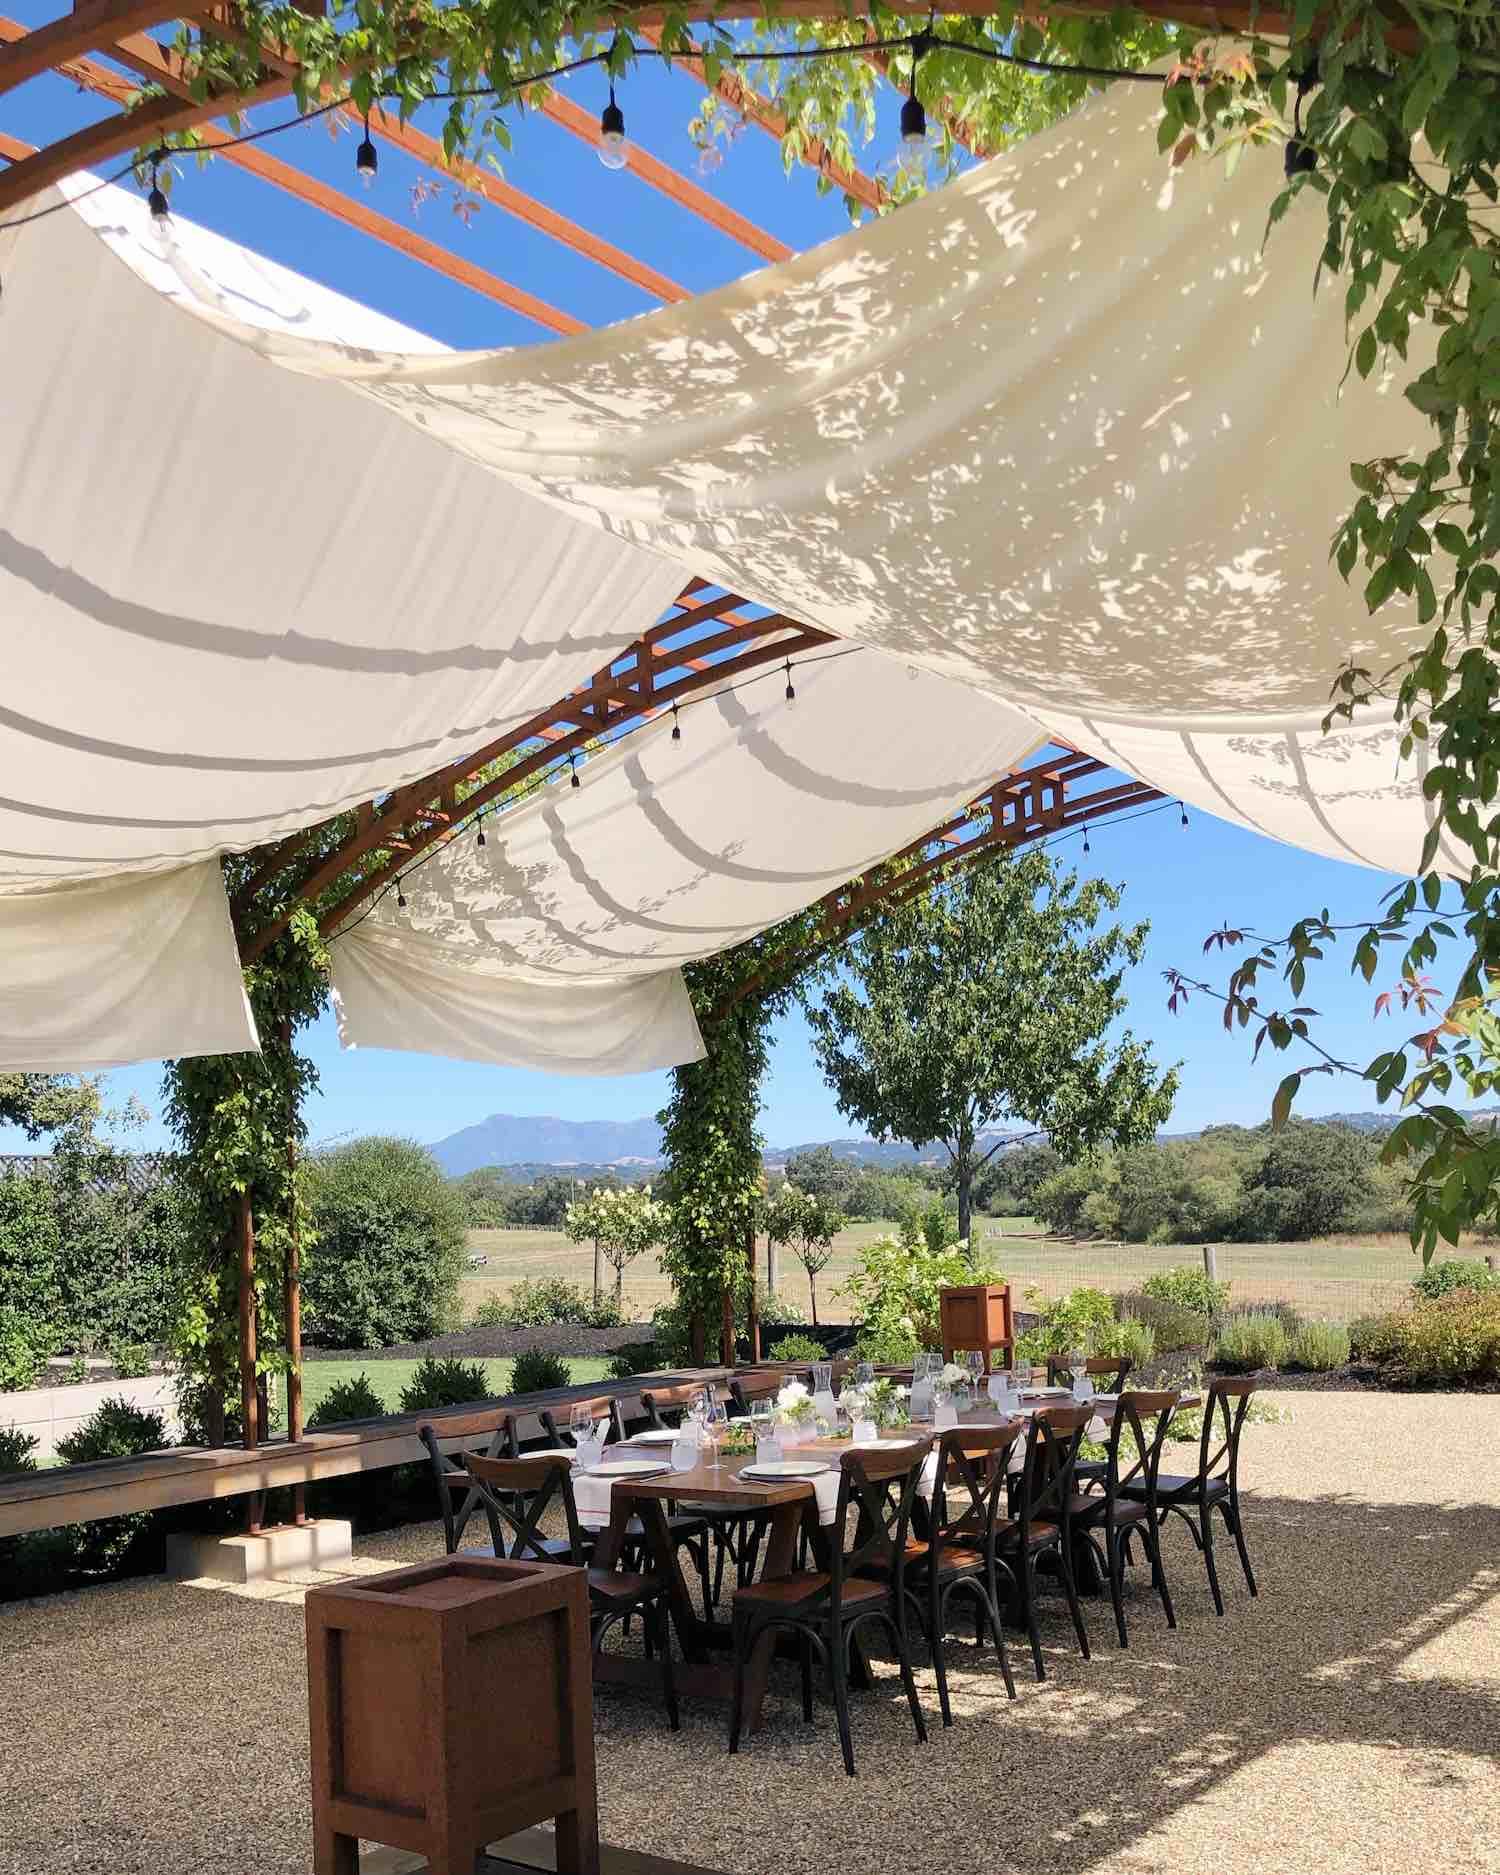 Most Instagram Worthy Wineries in Sonoma County - Bricoleur Vineyards